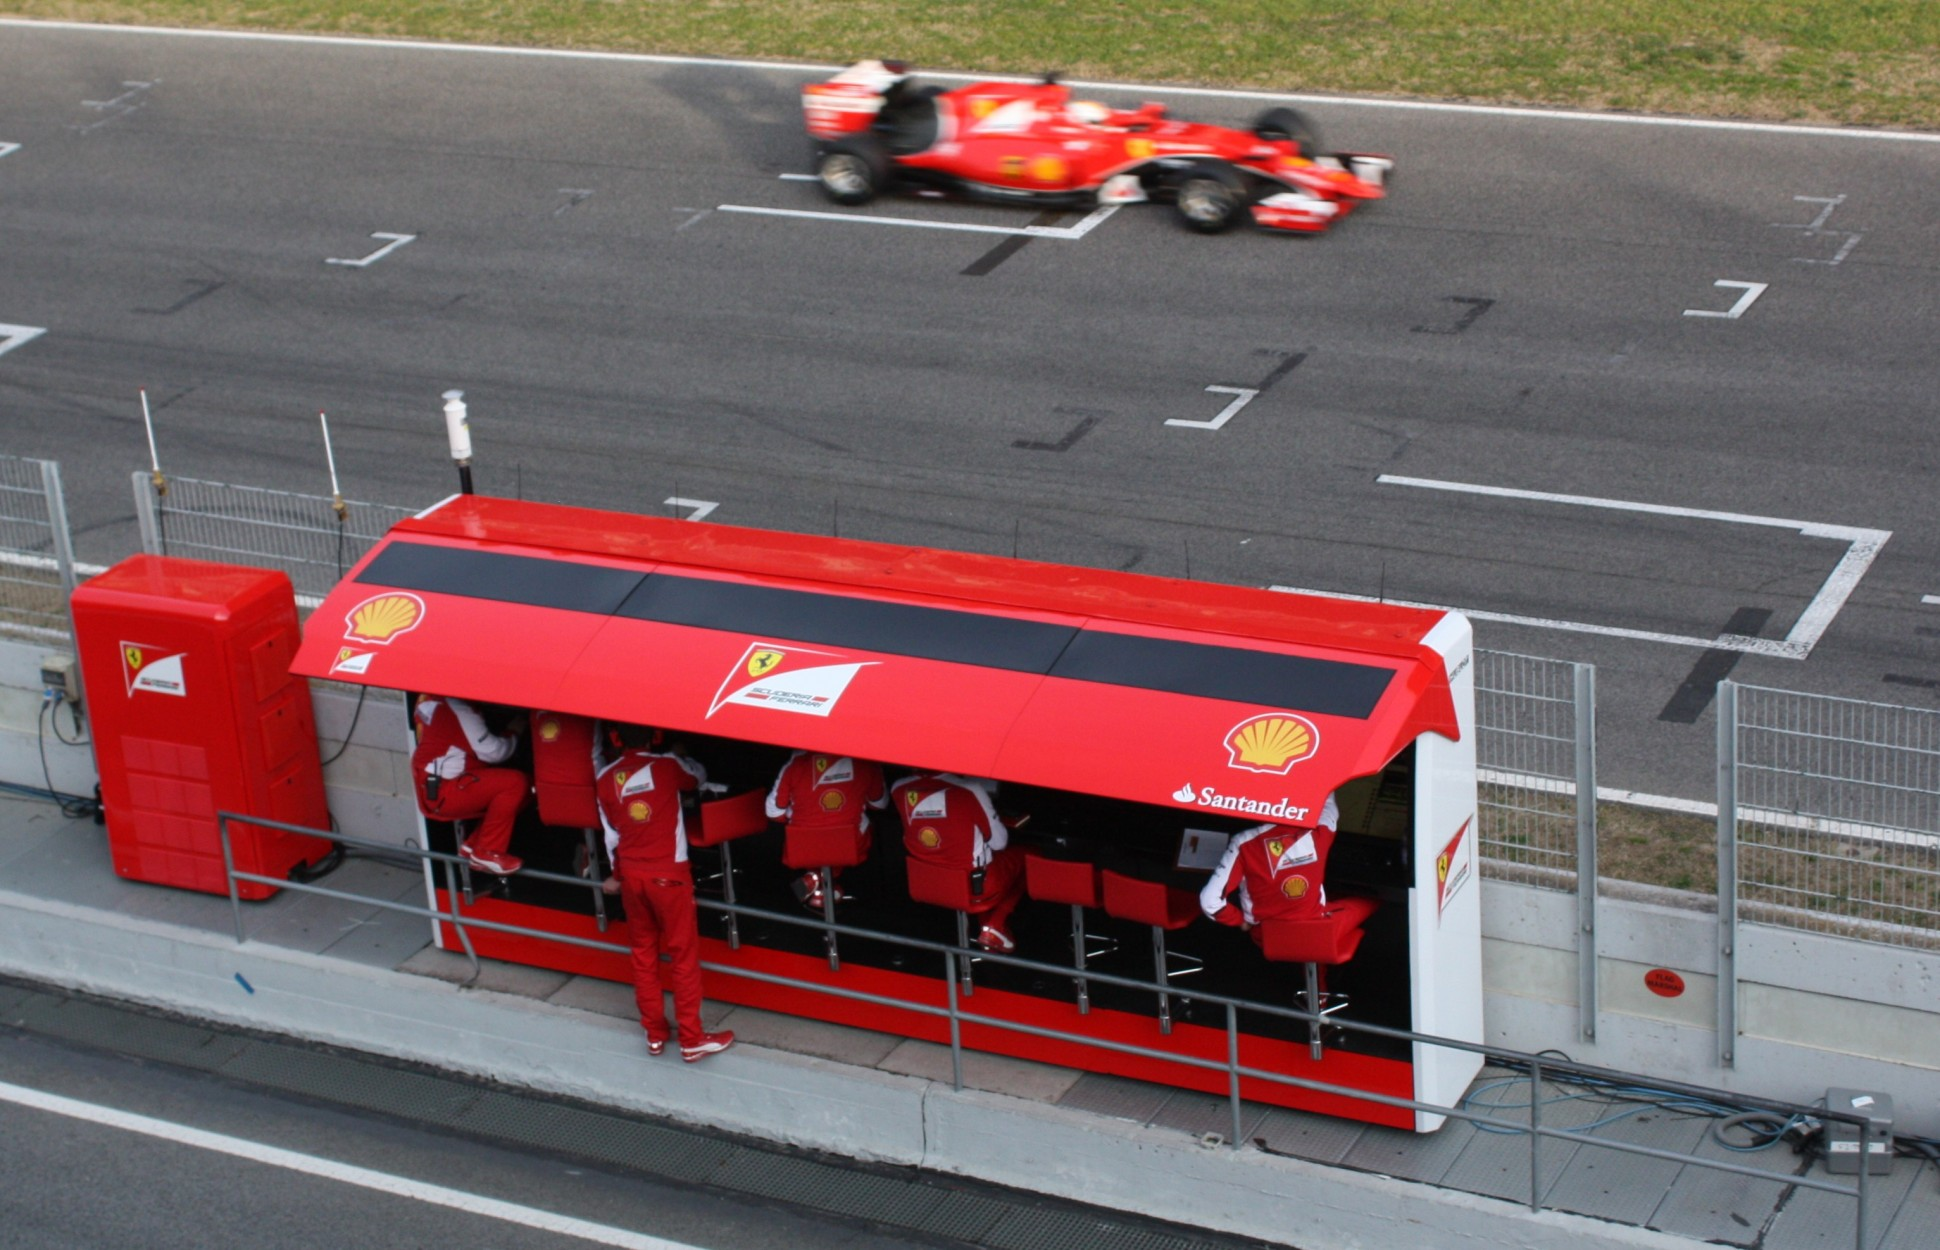 Sebastian Vettel exklusiv fürs SPORT BILD Sonderheft. Credit: privat